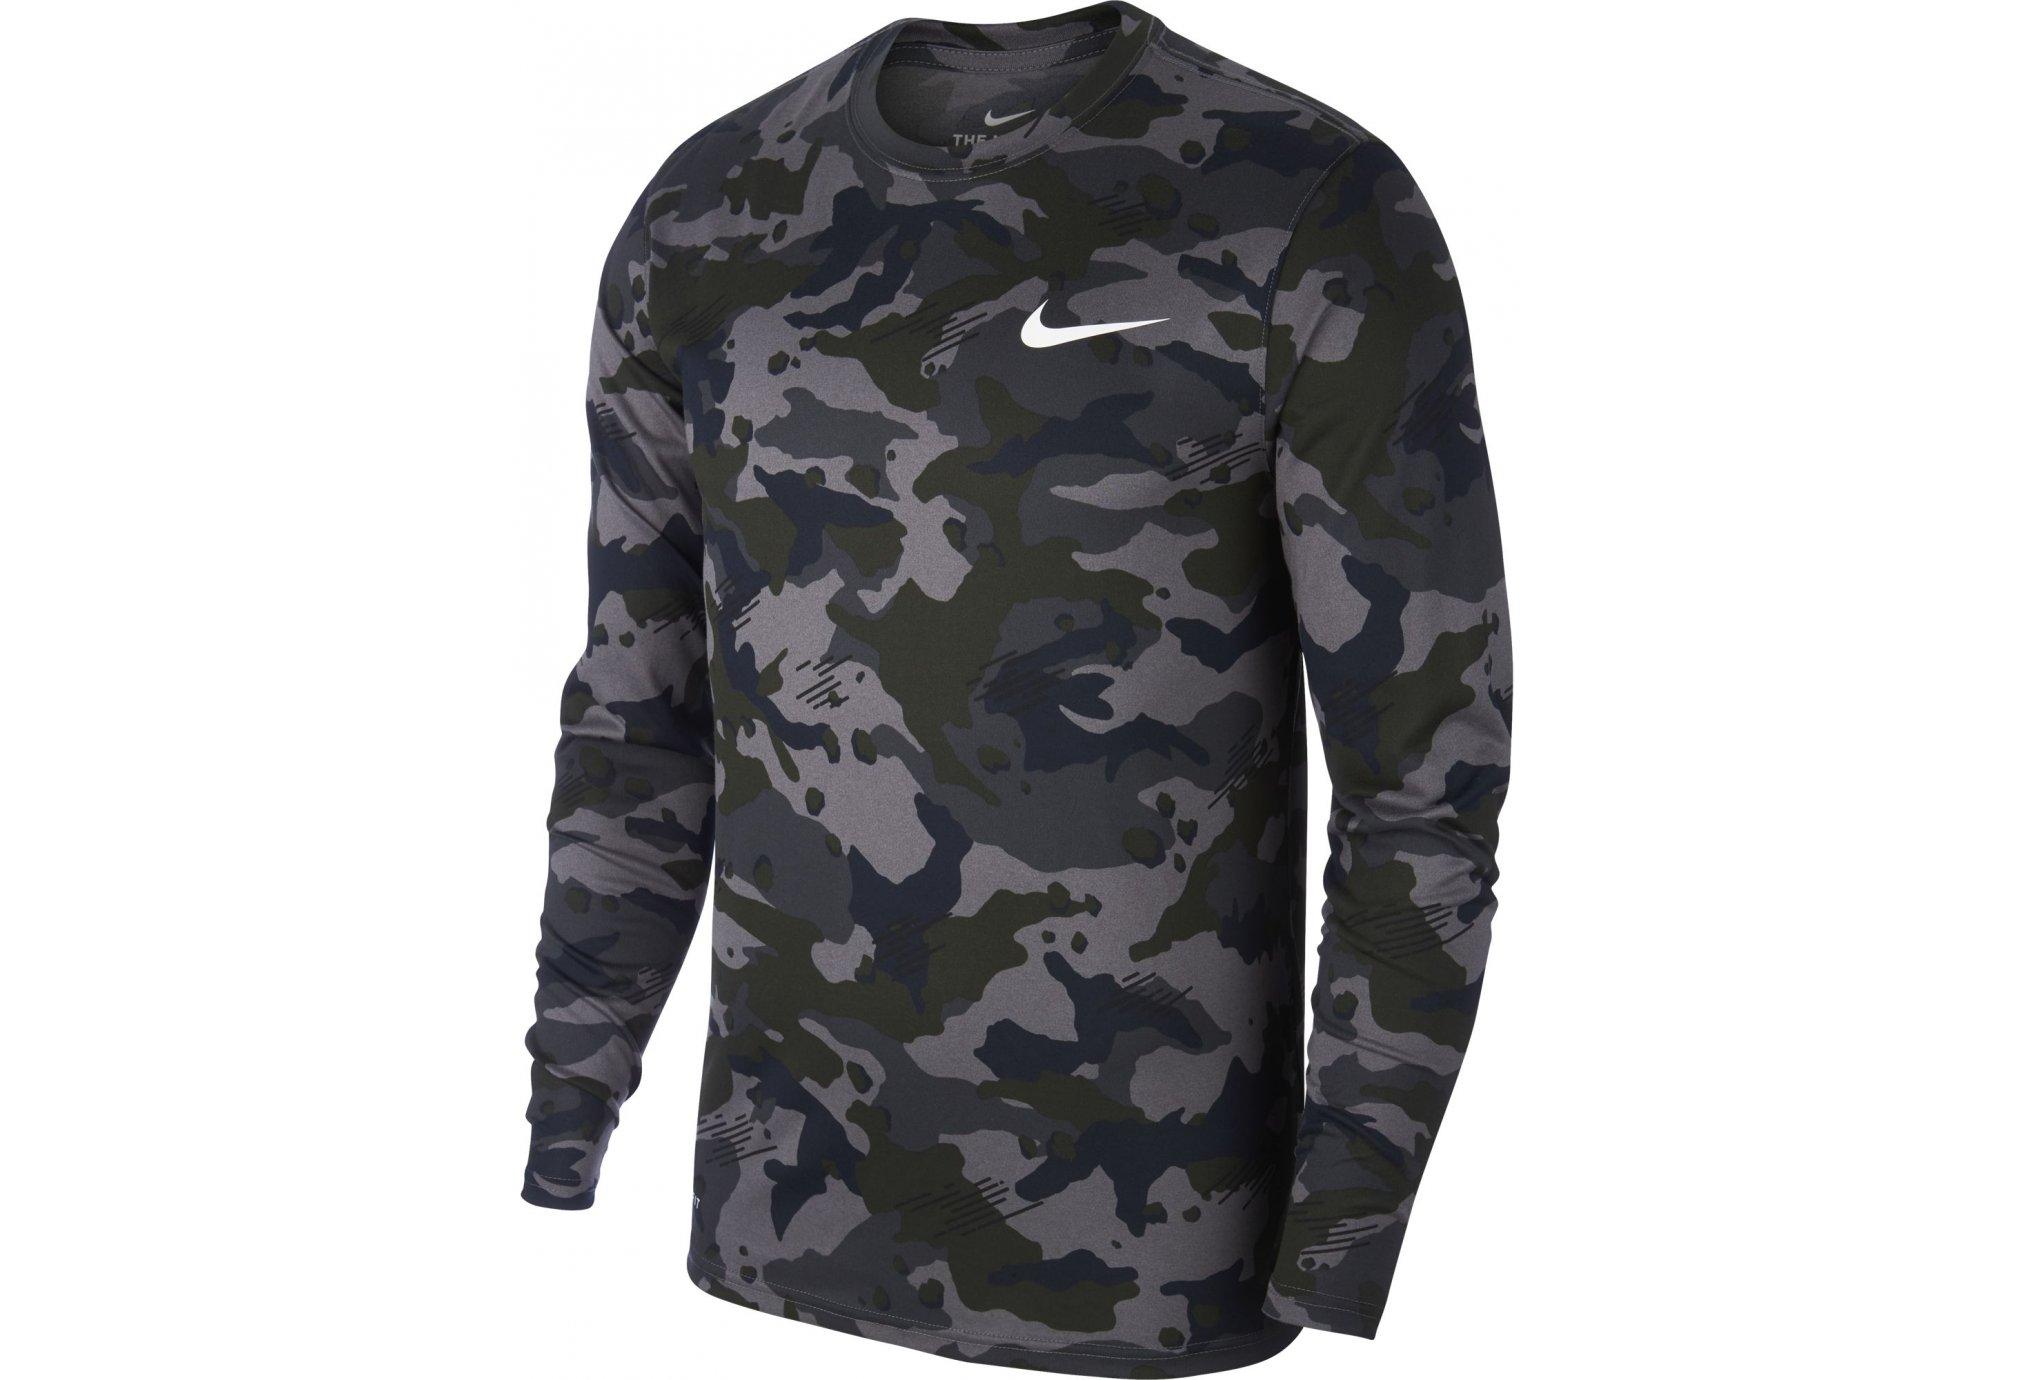 Nike Dri-Fit Legend M vêtement running homme